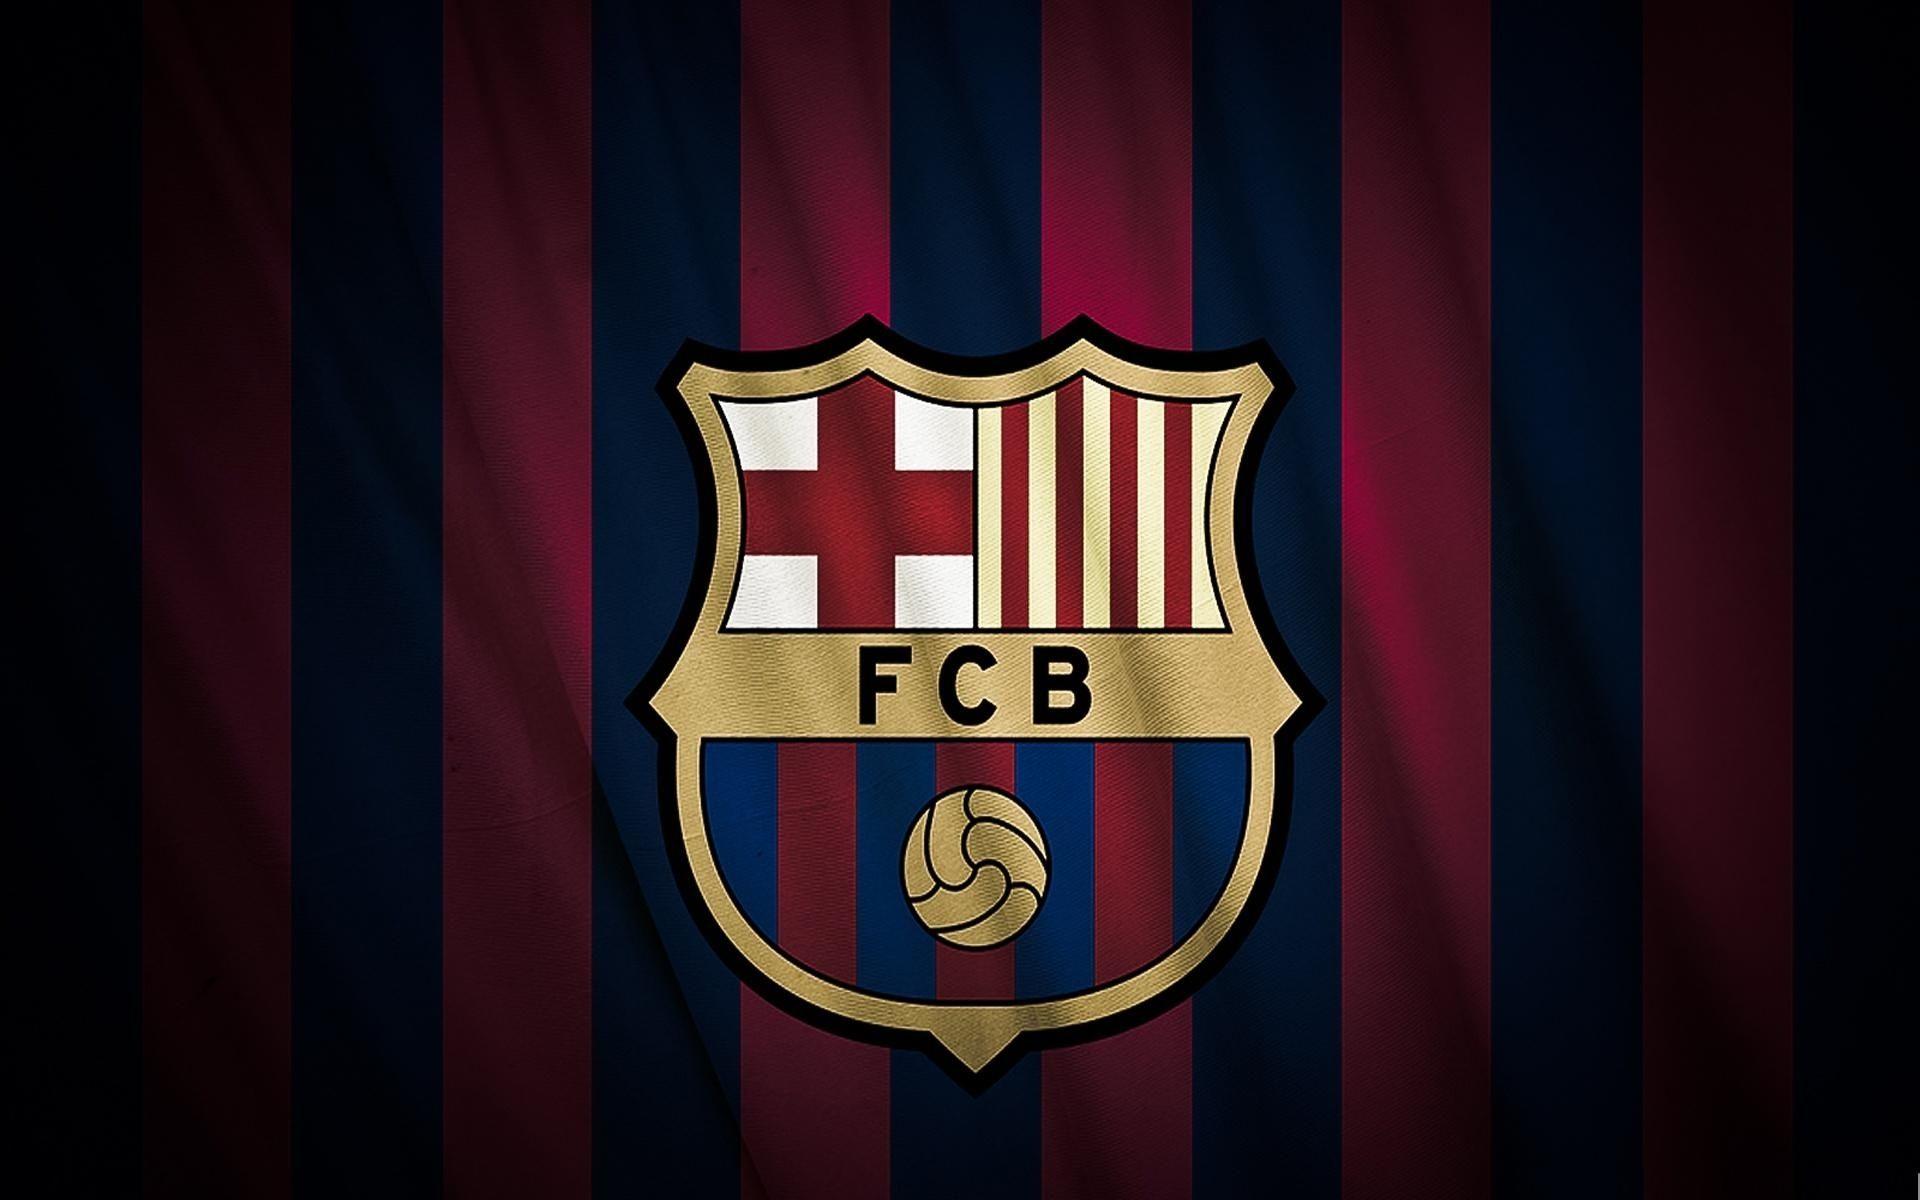 10 Best Barcelona Football Club Wallpaper FULL HD 1080p For PC Desktop